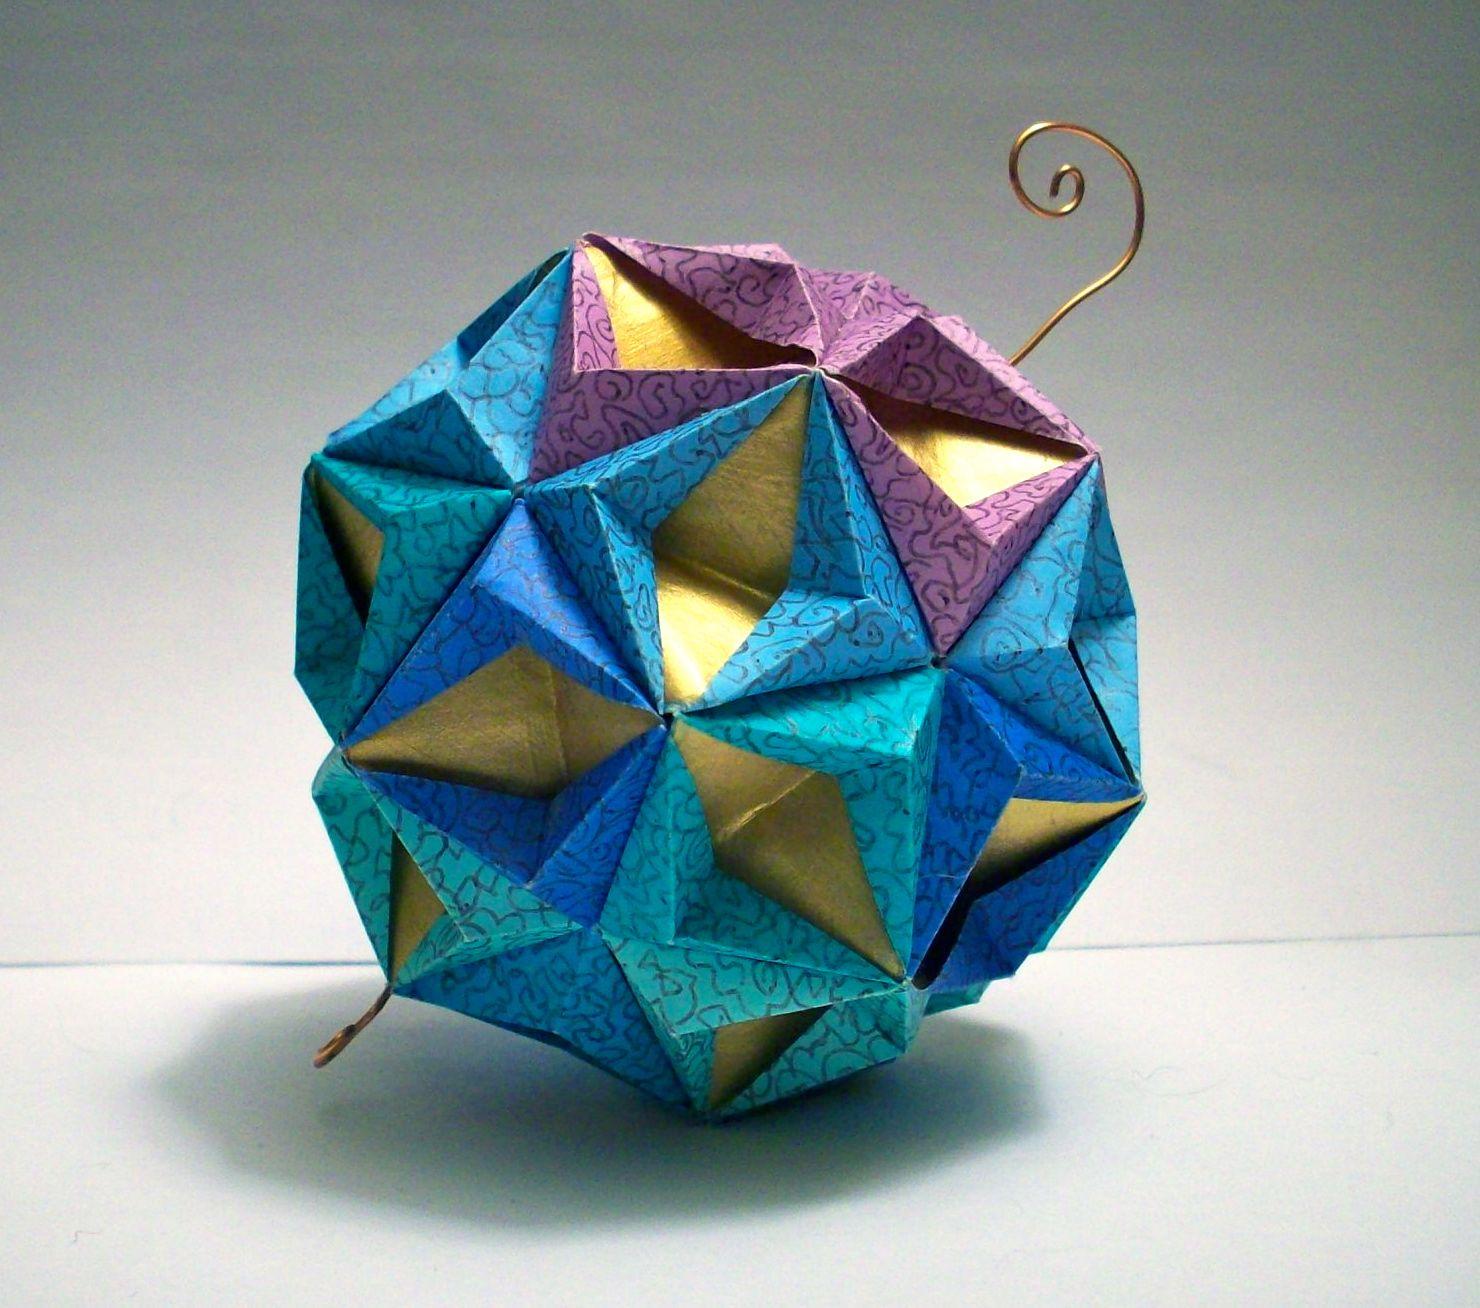 Origami Modular Star Ball - Gold, Blue, Green and Purple ... - photo#32